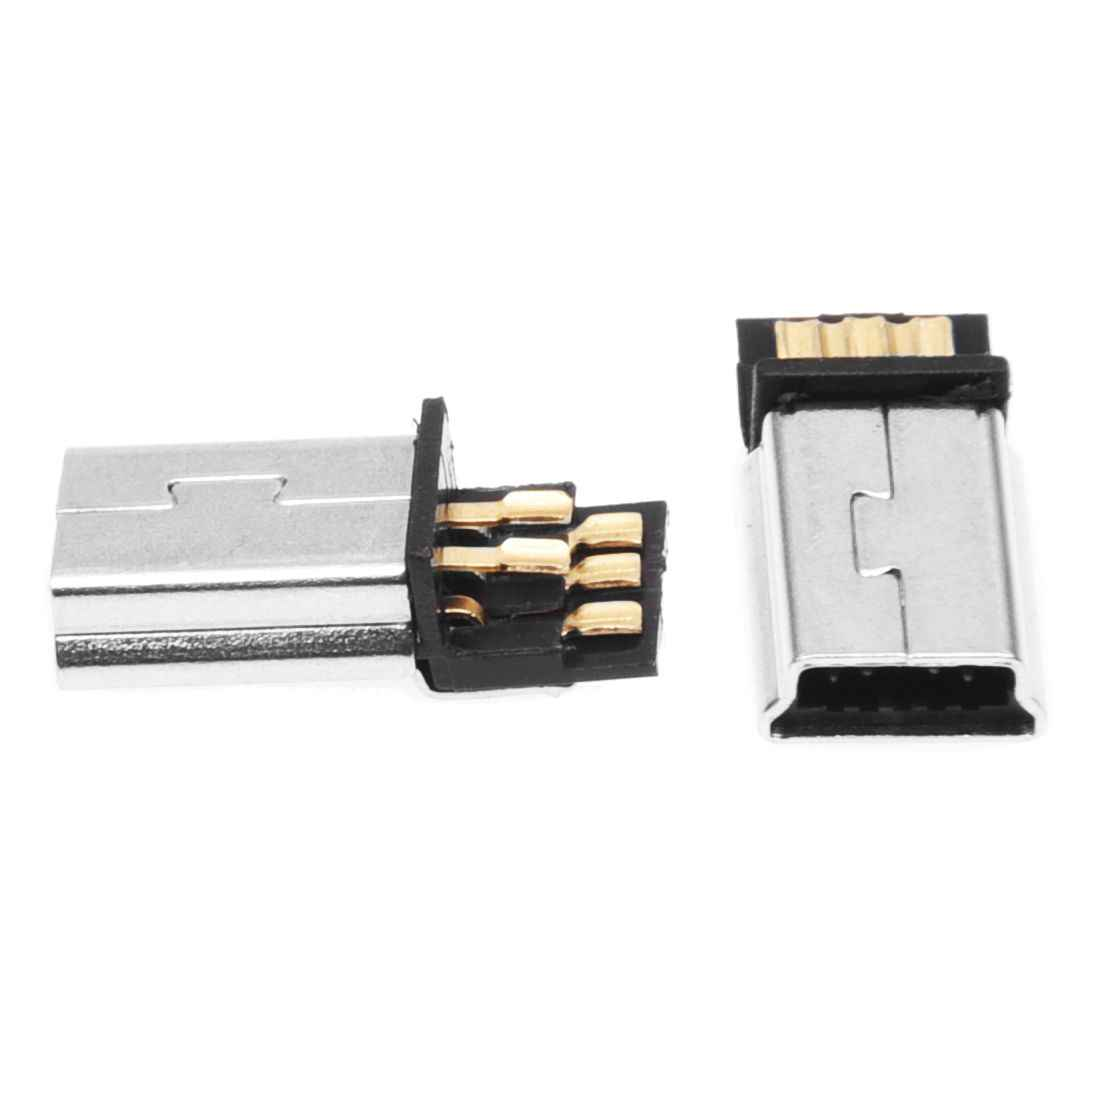 10 sztuk Mini USB 5 Pin męski wtyk DIY złącze SMT srebrny Tone ciemny szary